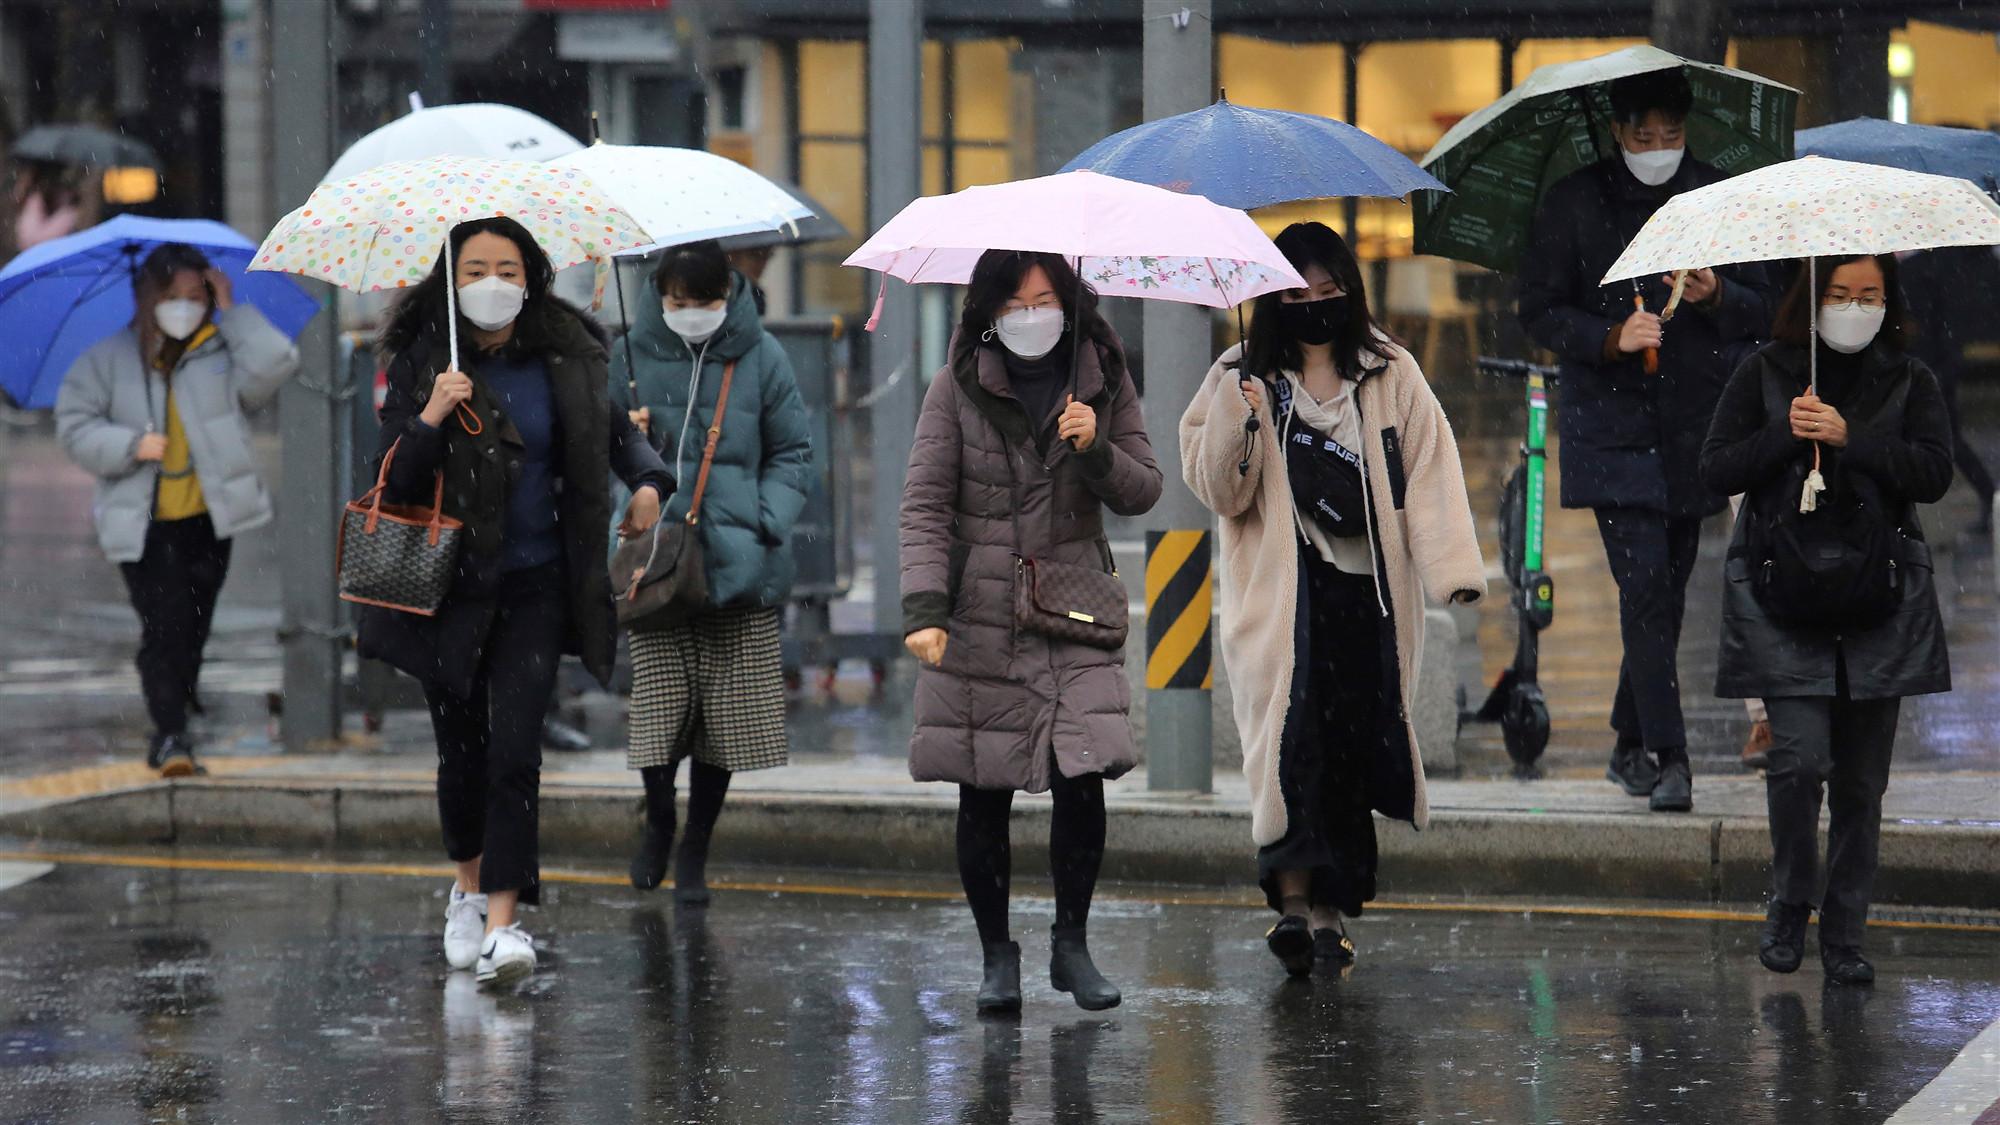 Chinese embassy in ROK donates masks to coronavirus affected areas